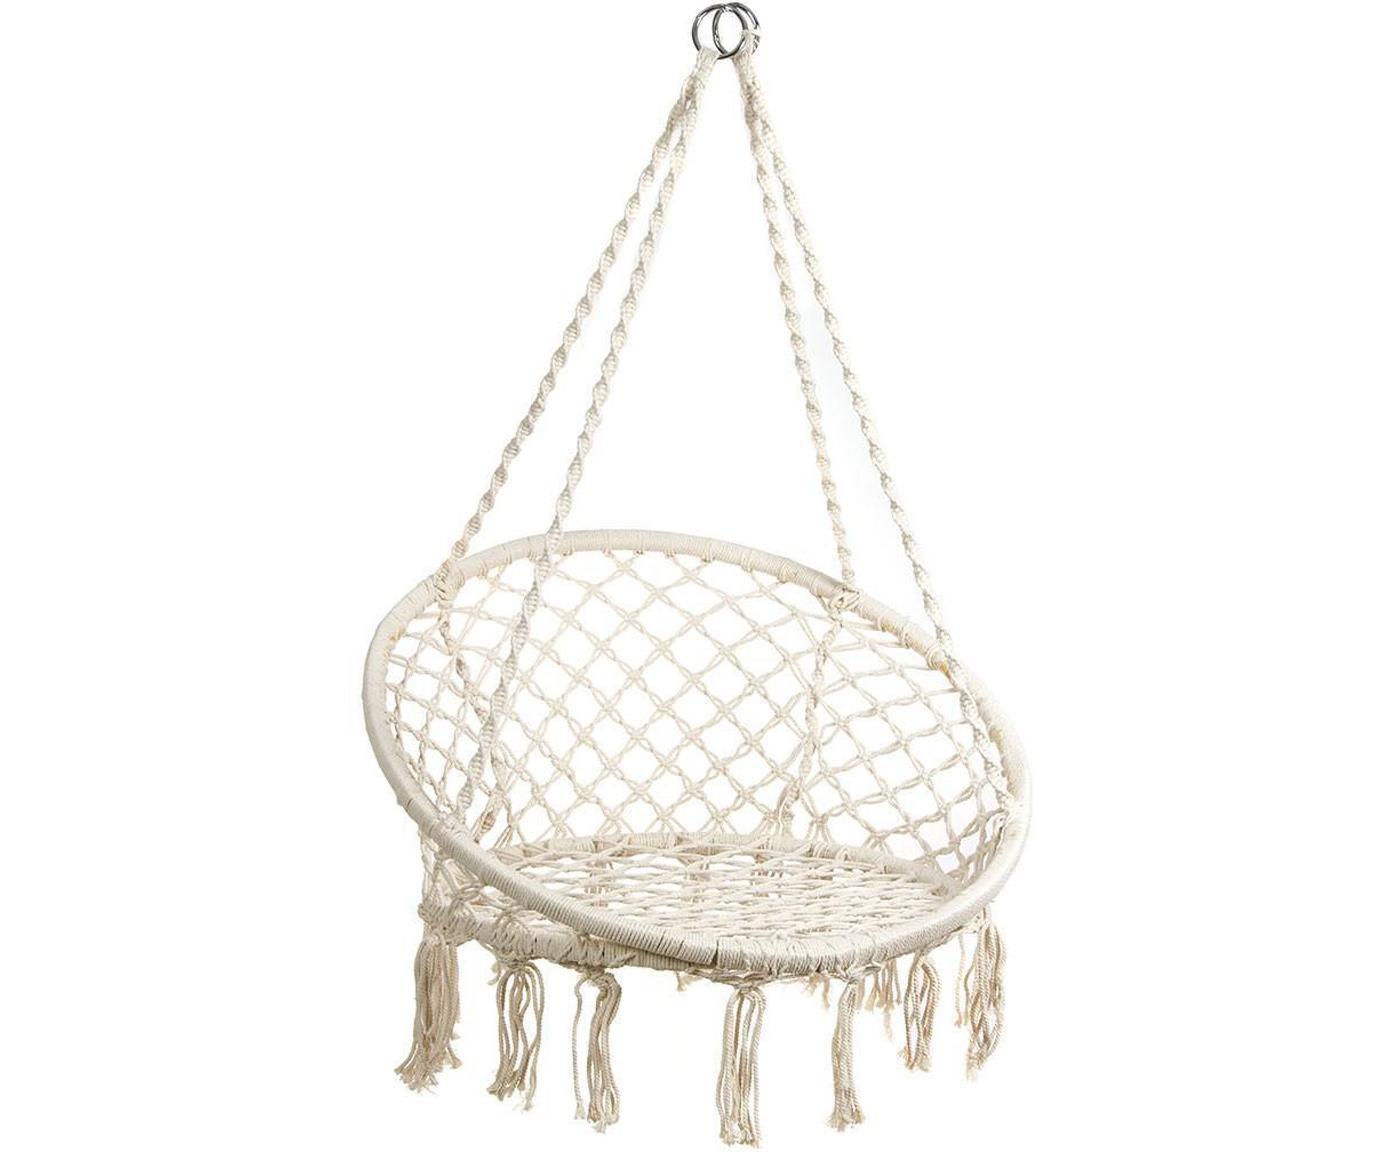 Silla colgante Nalita, Estructura: acero, Beige, Ø 82 x Al 111 cm